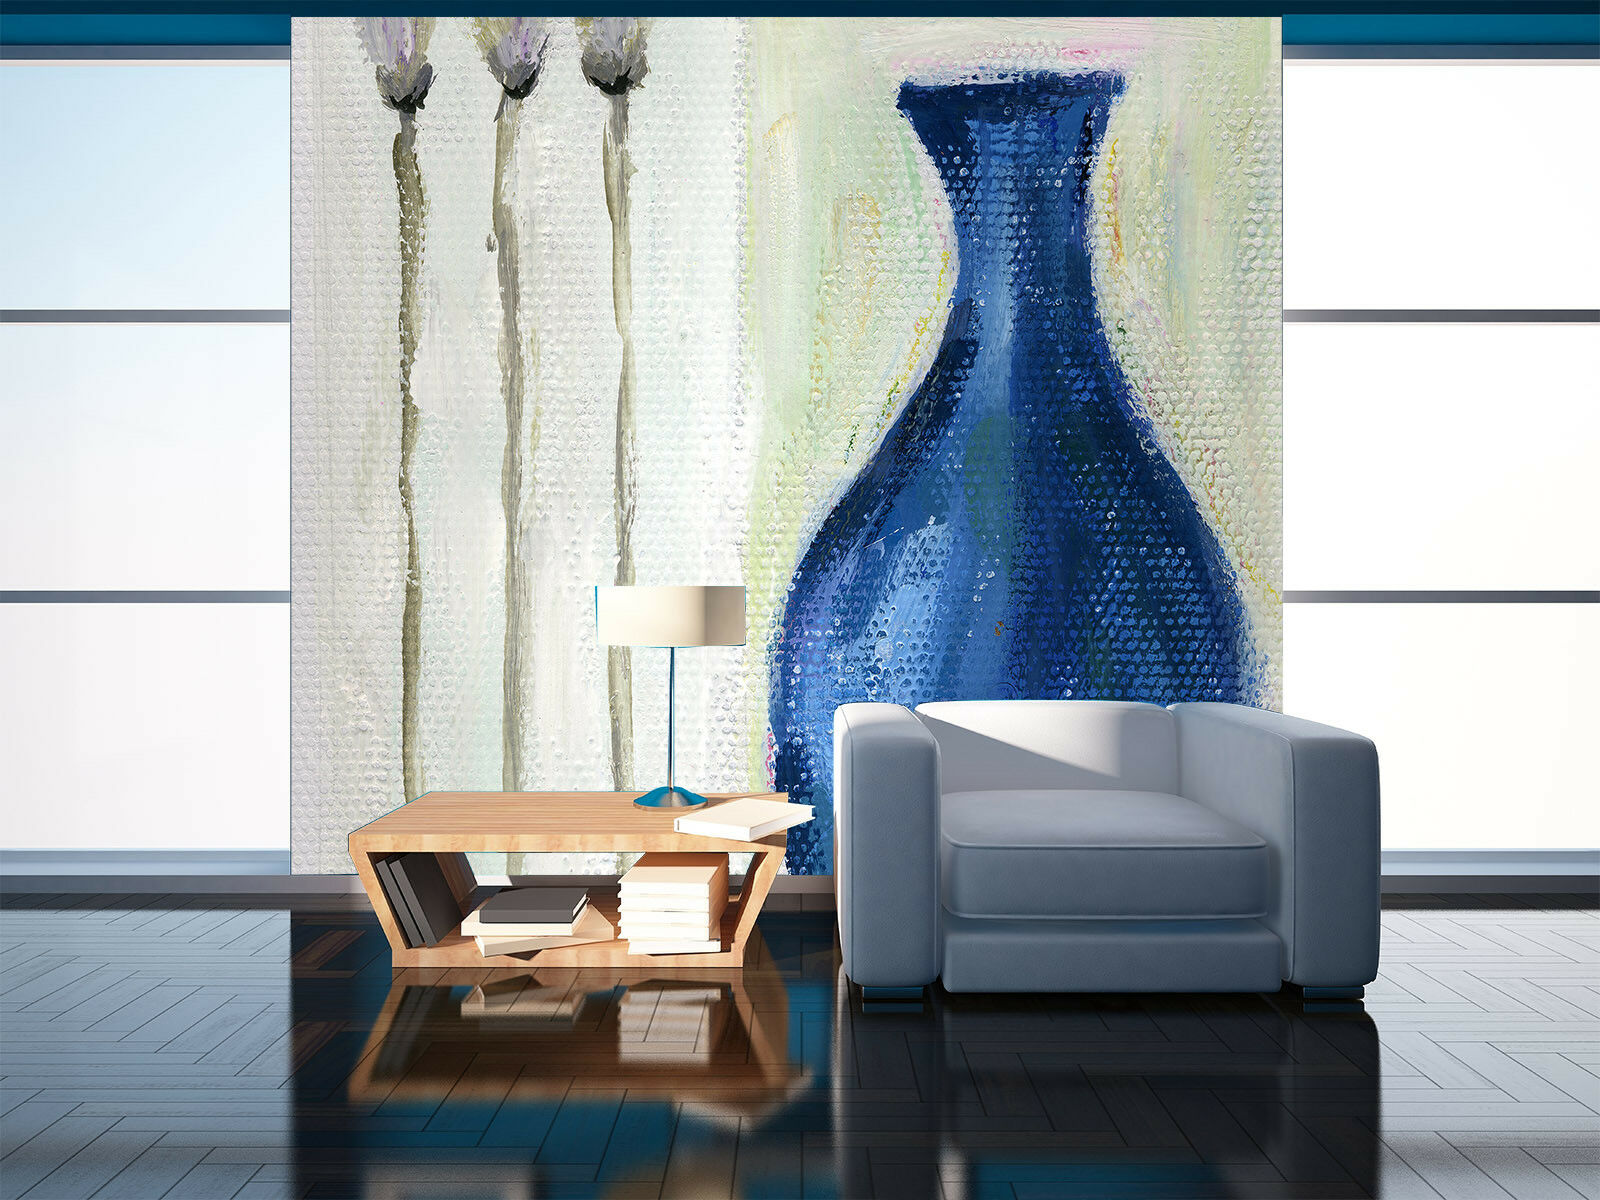 3D bluee Vase Flowers 8 Wall Paper Murals Wall Print Wall Wallpaper Mural AU Kyra